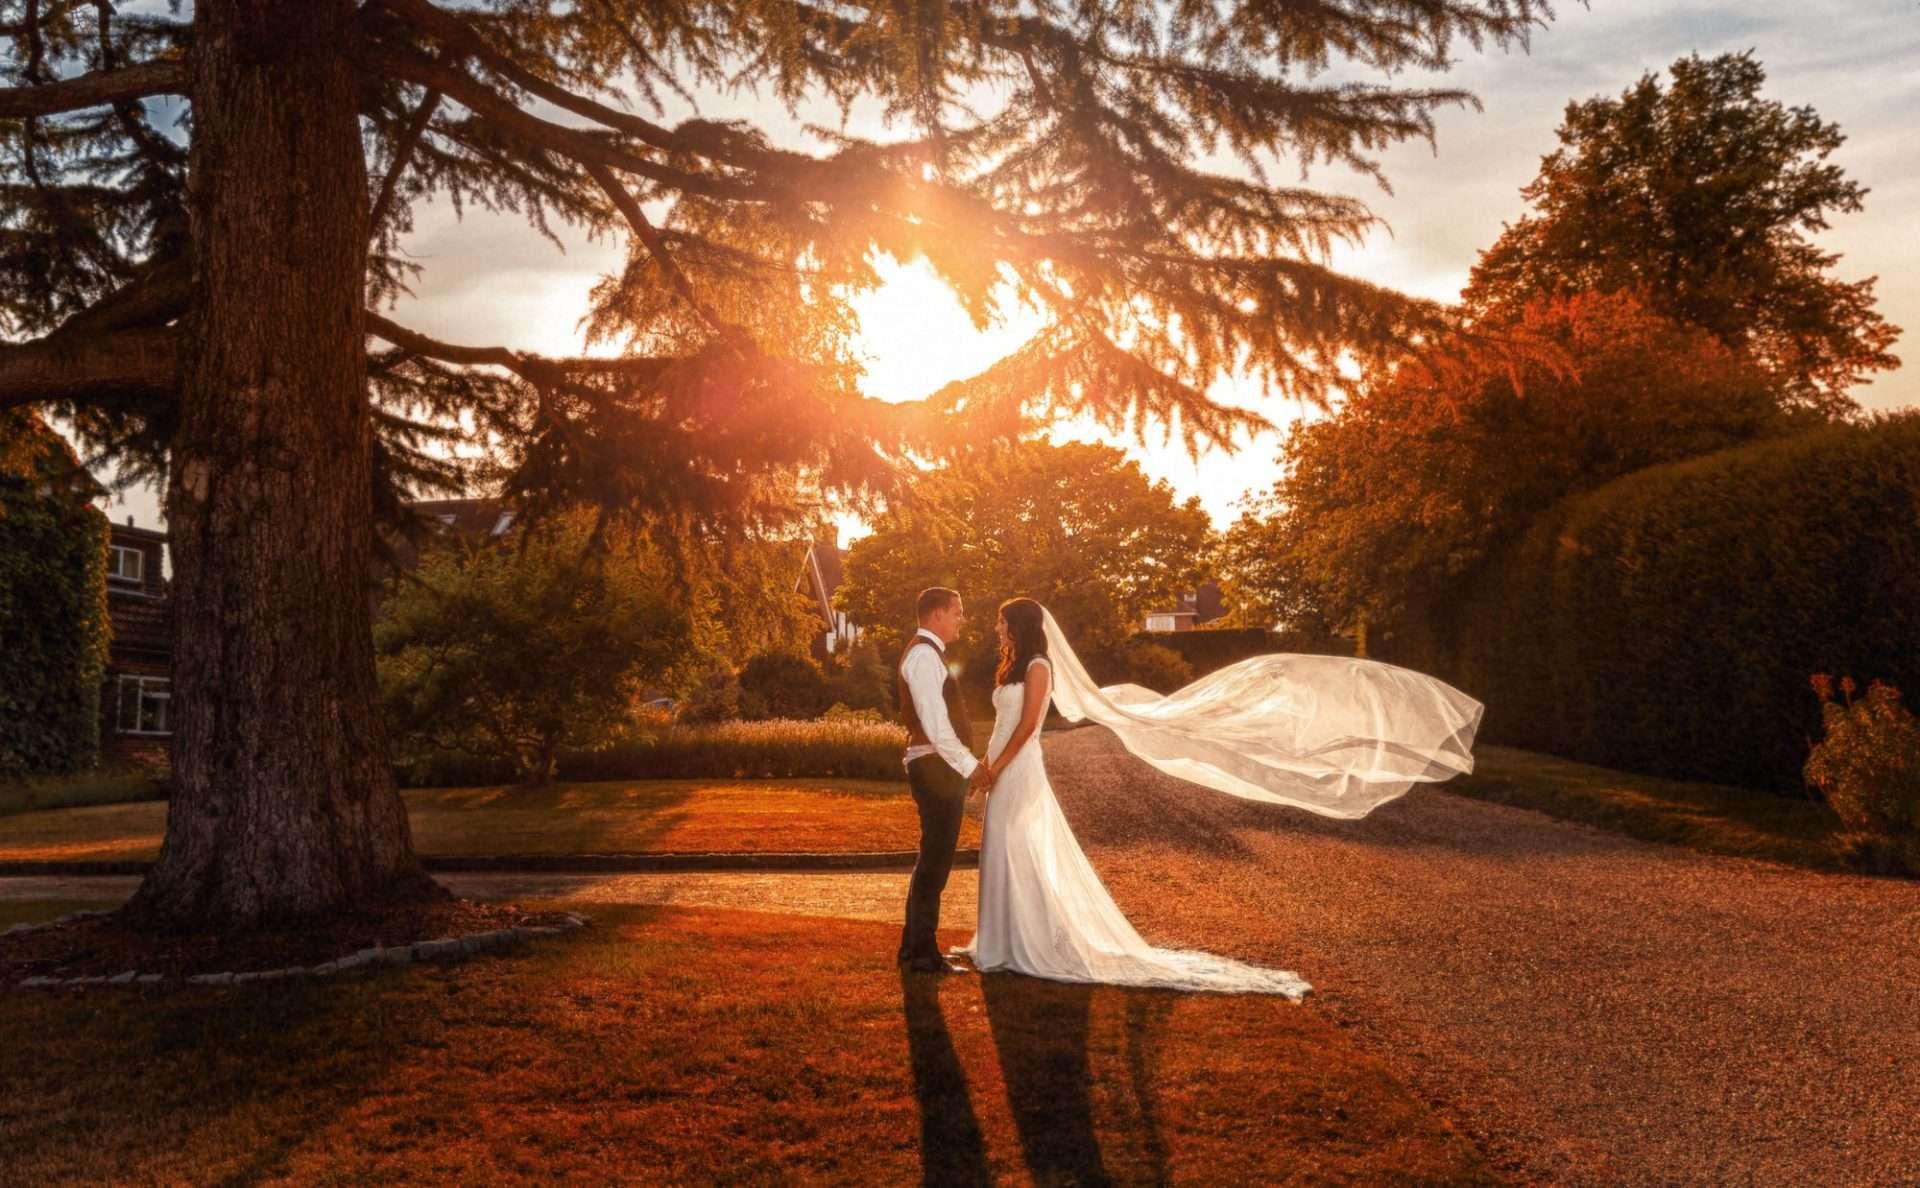 Surrey-wedding-photography-Chris-Woodman-Photographer-01